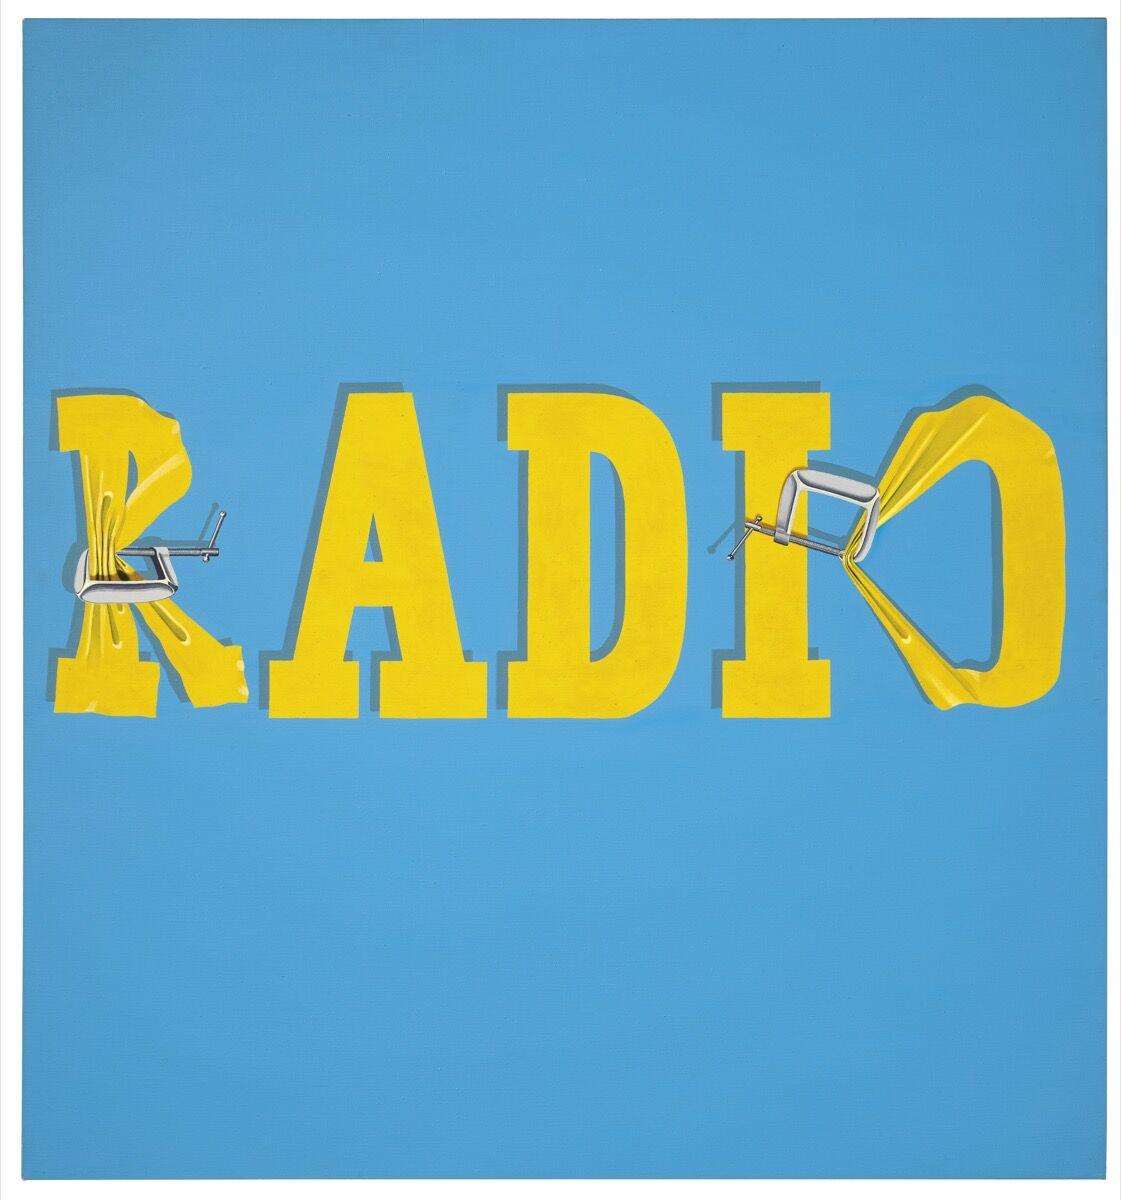 Ed Ruscha, Hurting the Word Radio #2, 1964. Courtesy of Christie's.